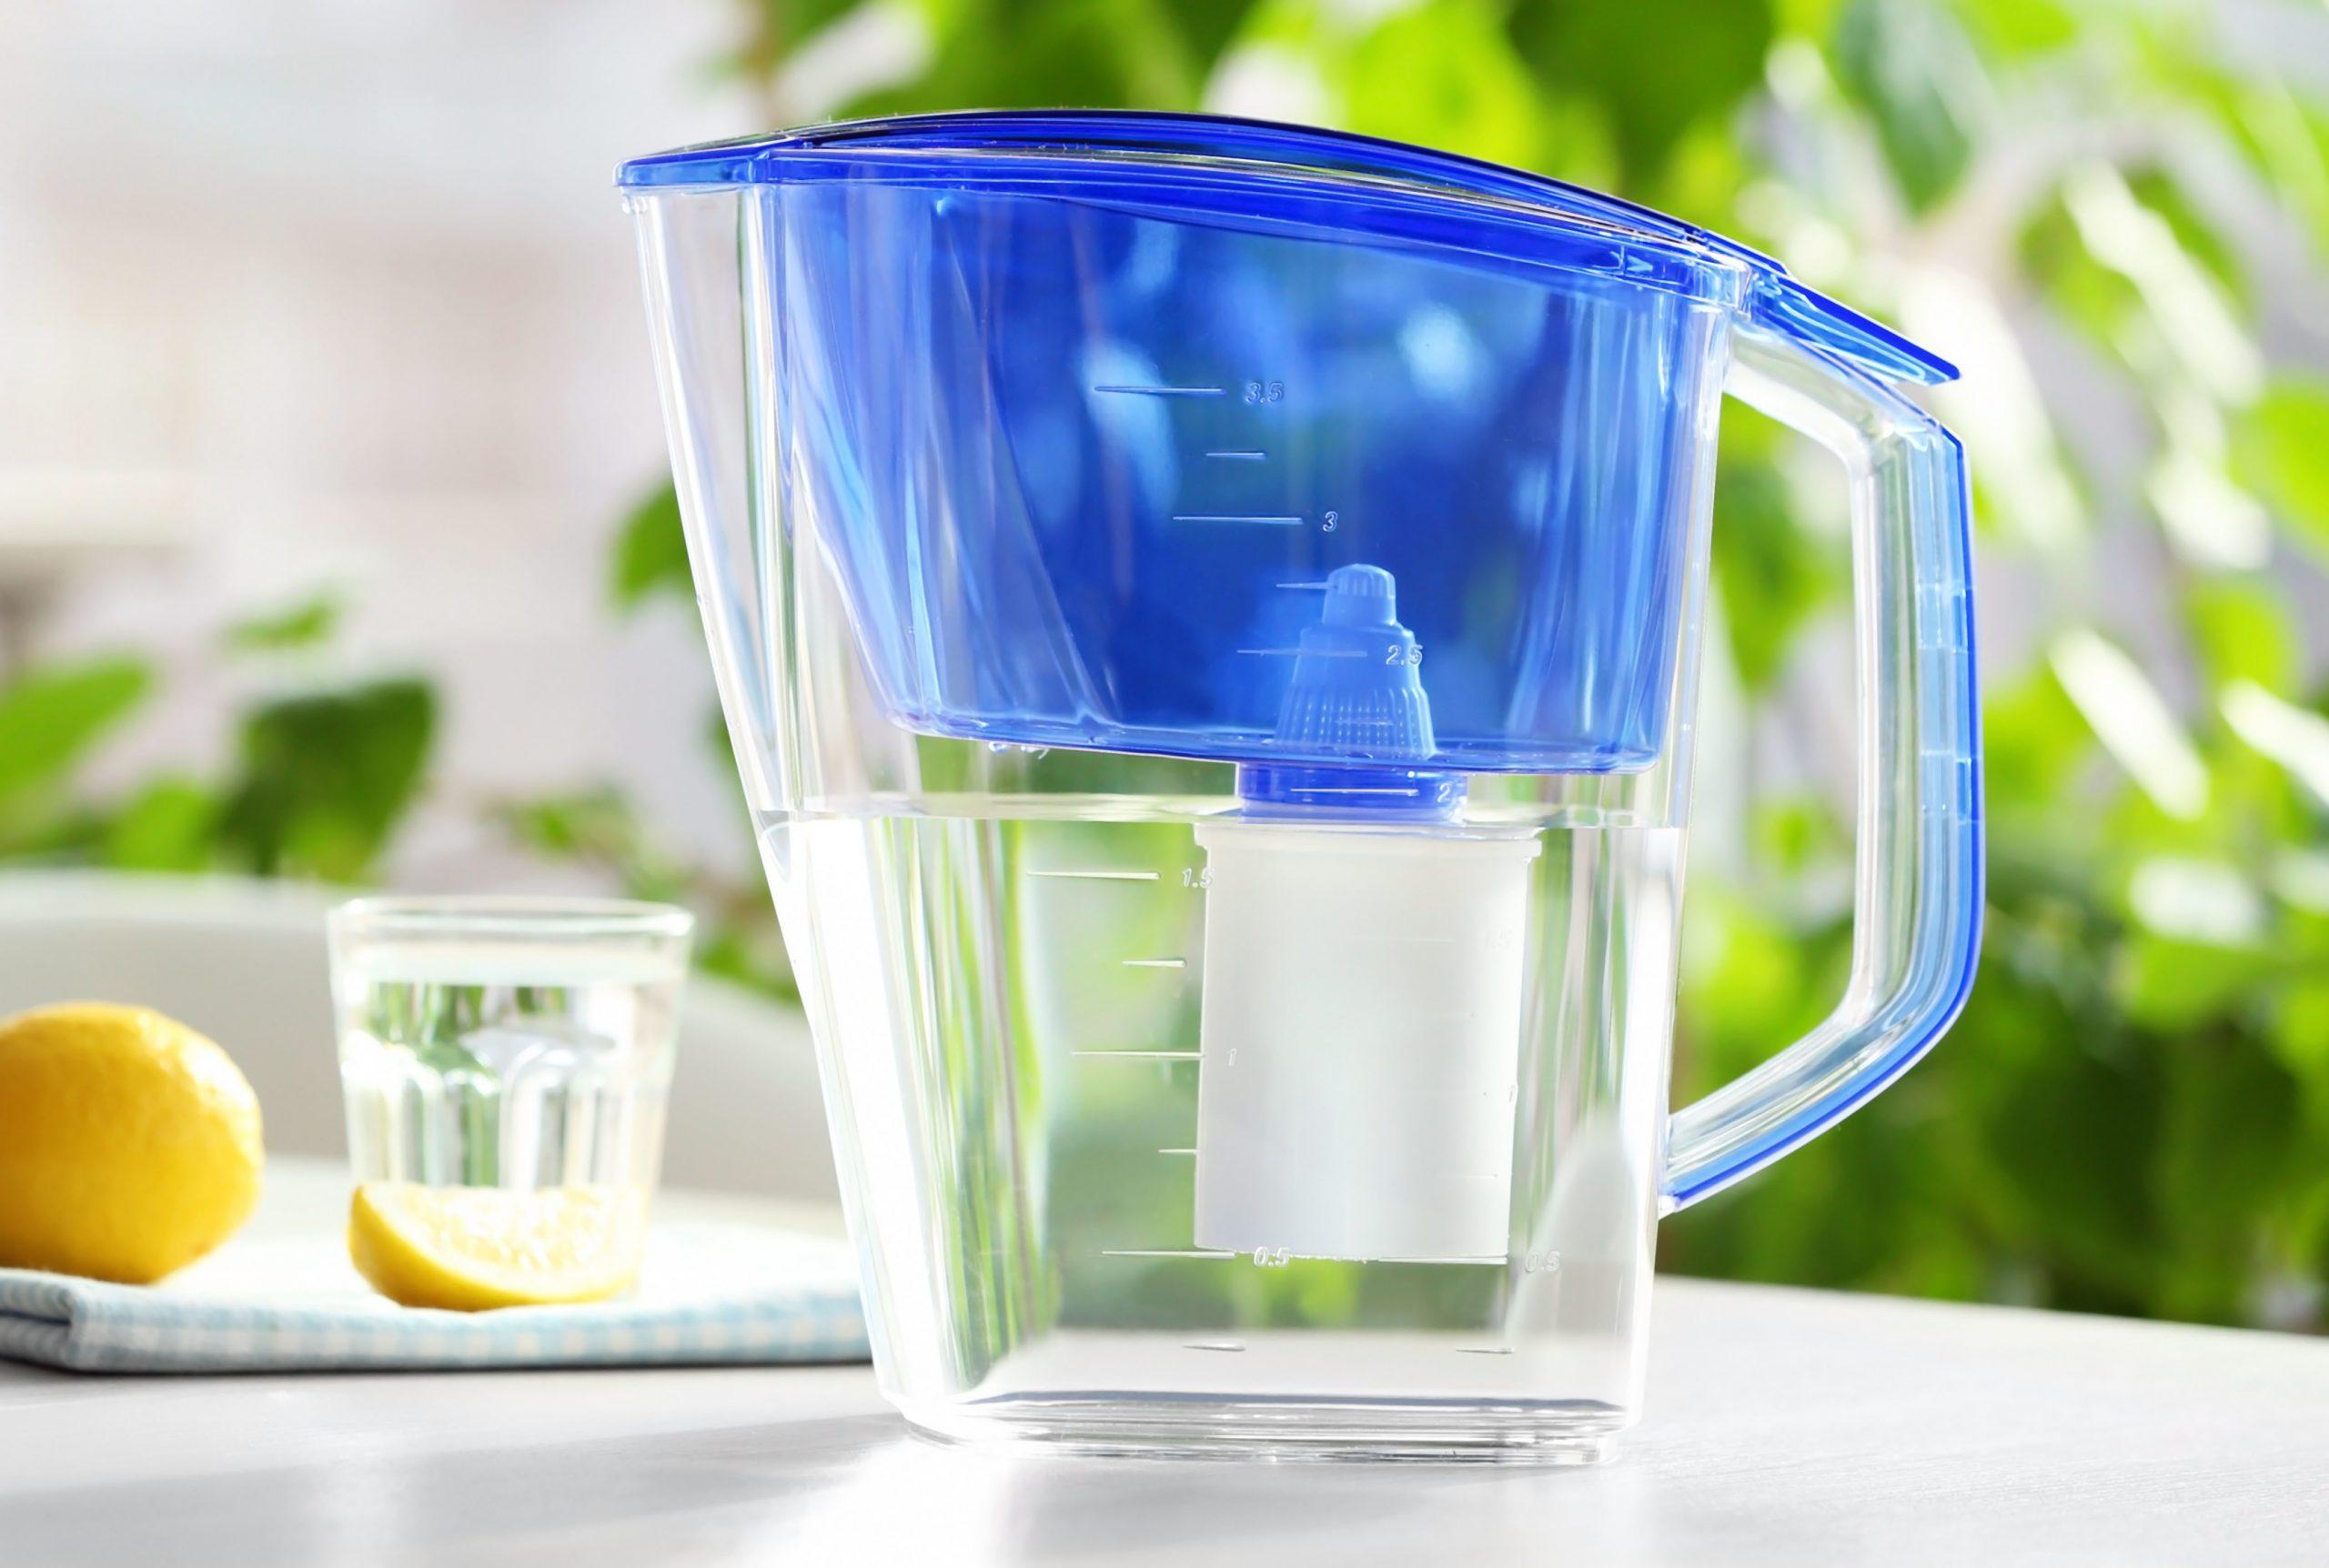 Purificador de agua de jarra